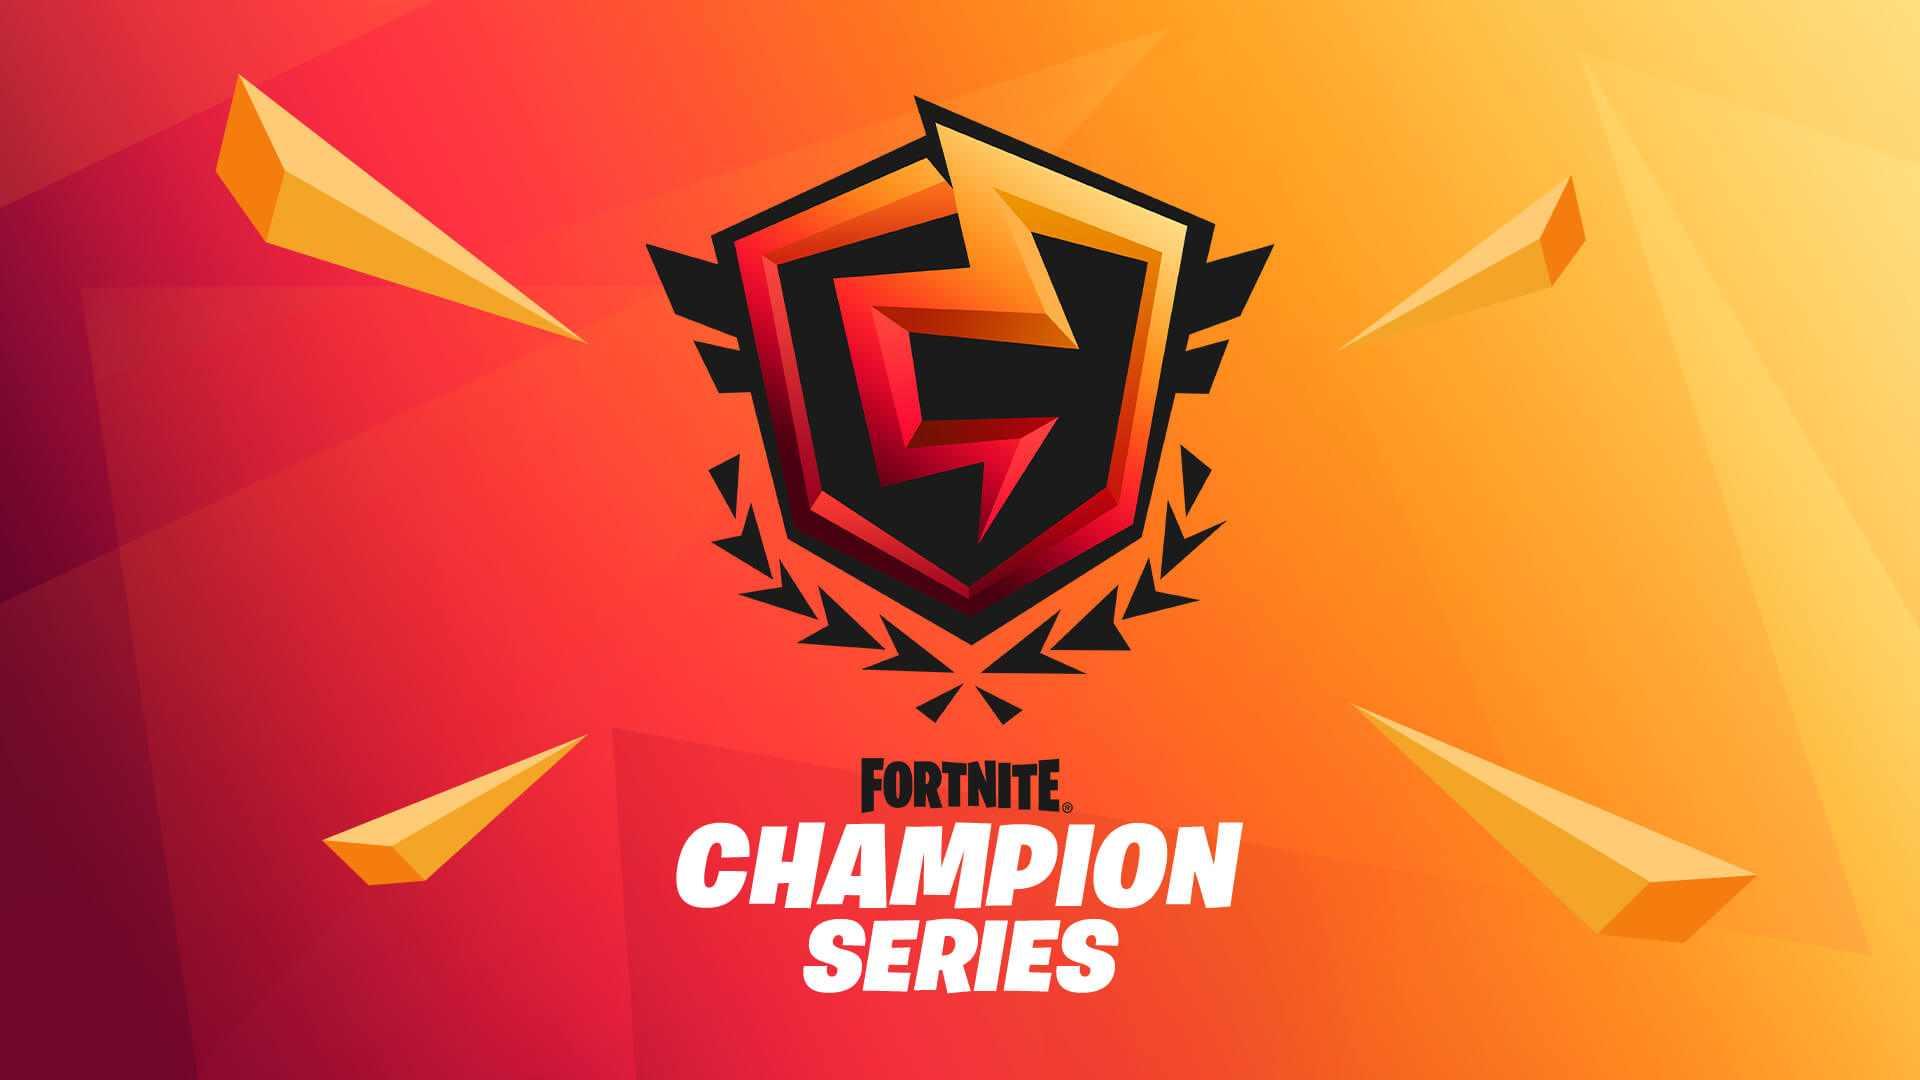 FortniteChampion Series (FNCS)